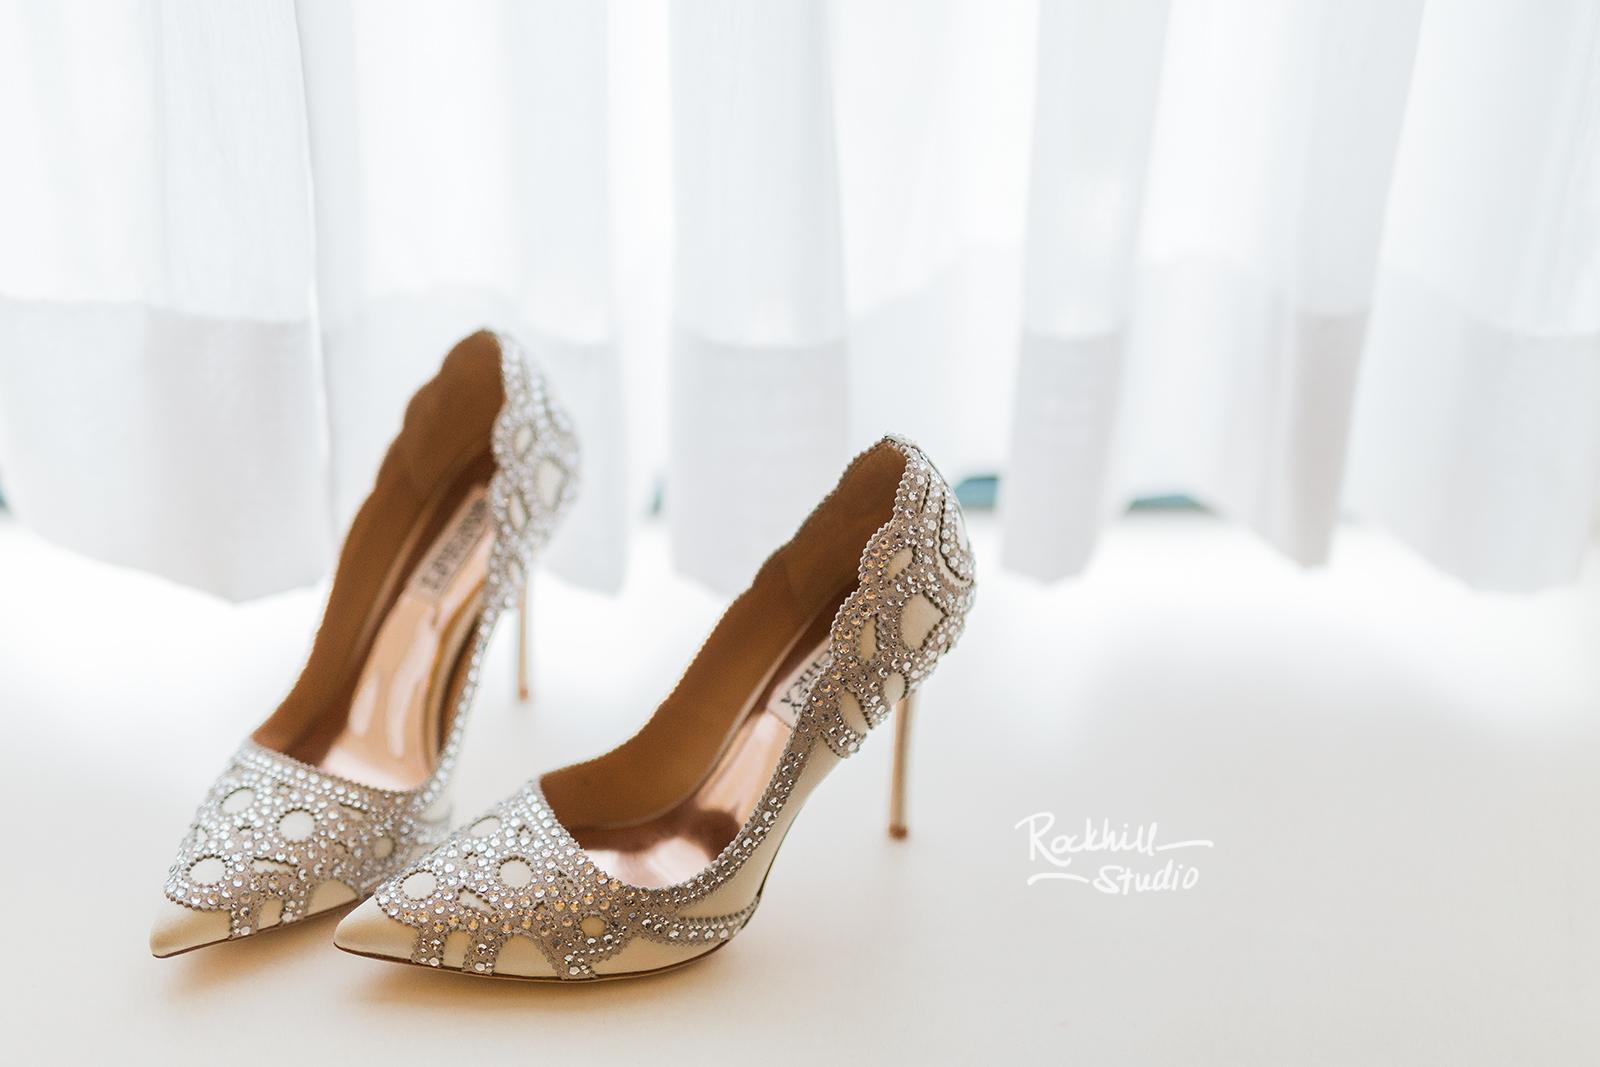 traverse city wedding photographer bridal shoes detail rhinestones